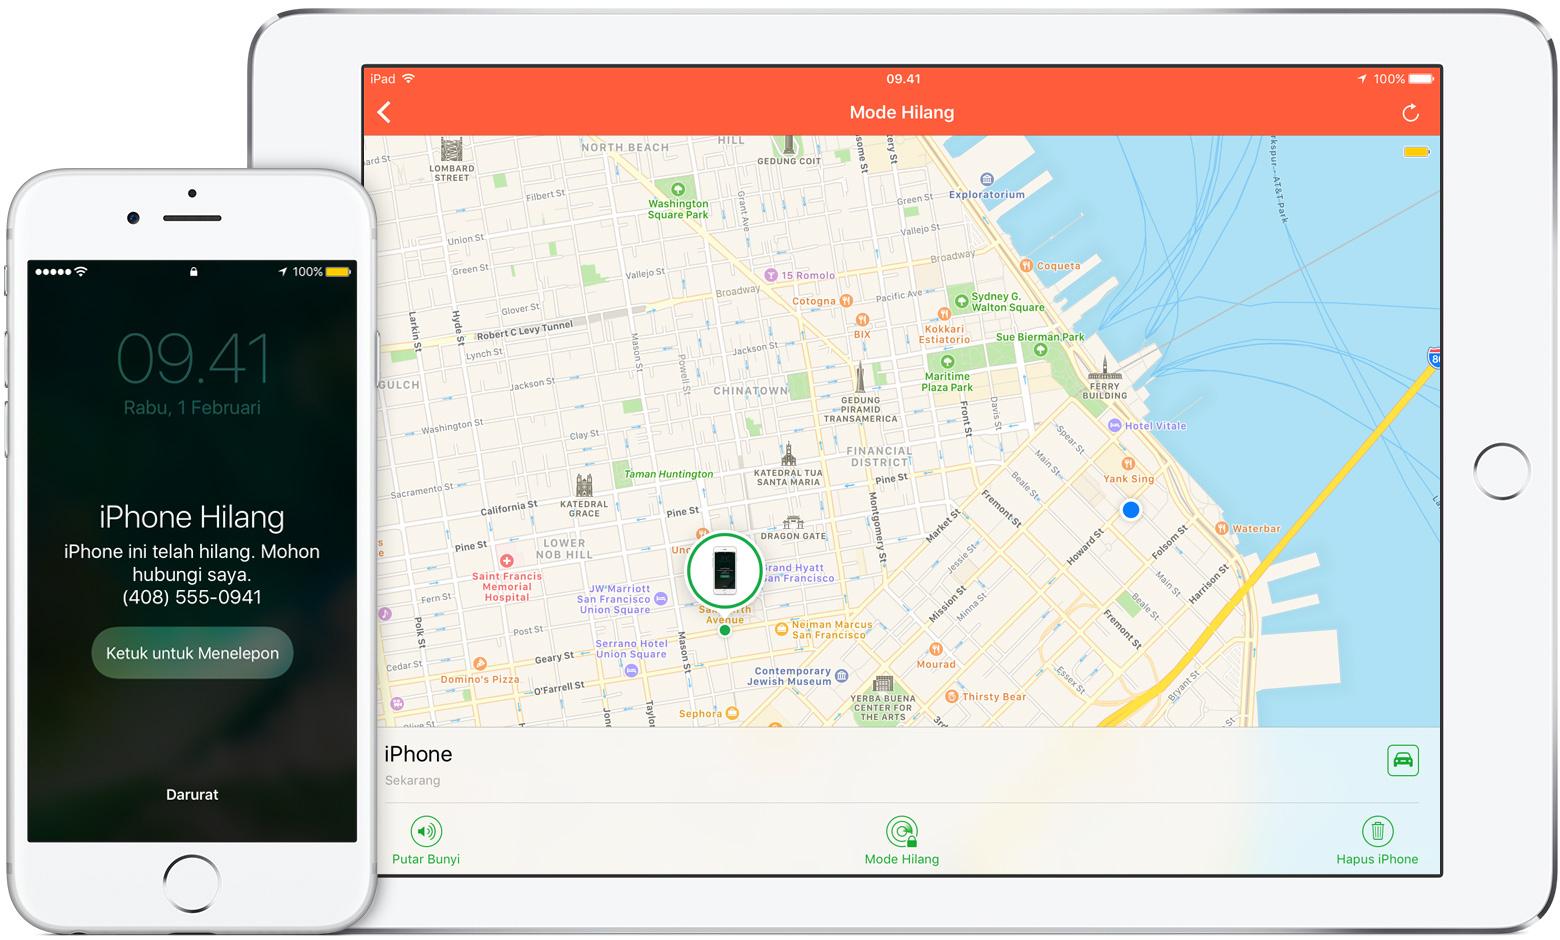 Cara Mudah Melacak iPhone yang Hilang Menggunakan IMEI dengan